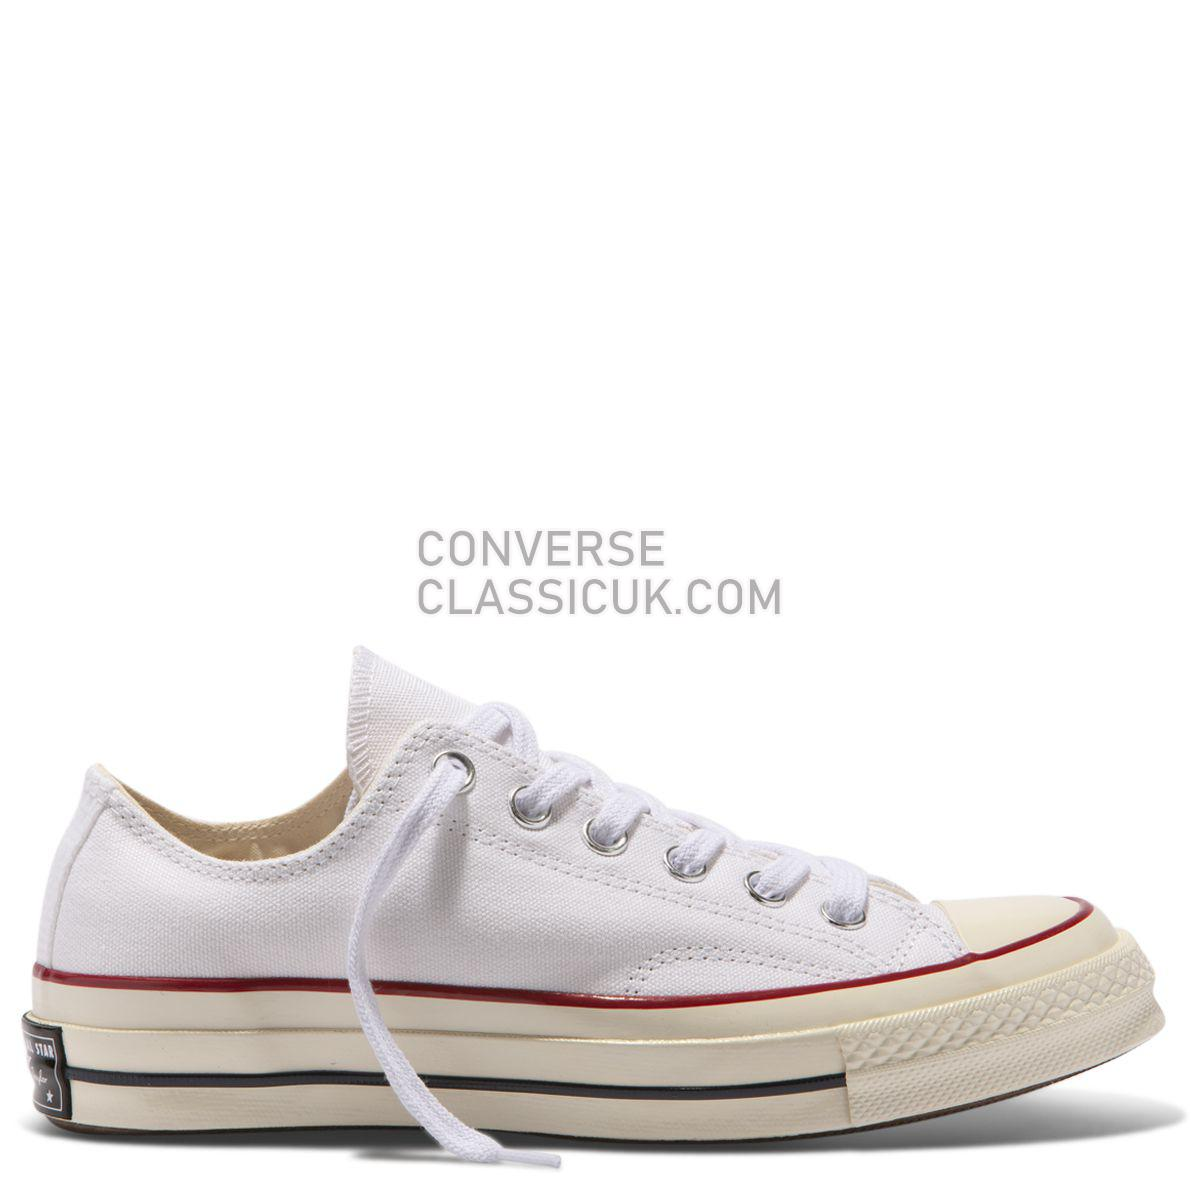 Converse Chuck Taylor All Star 70 Low Top White Mens Womens Unisex 162065 White/Garnet/Egret Shoes